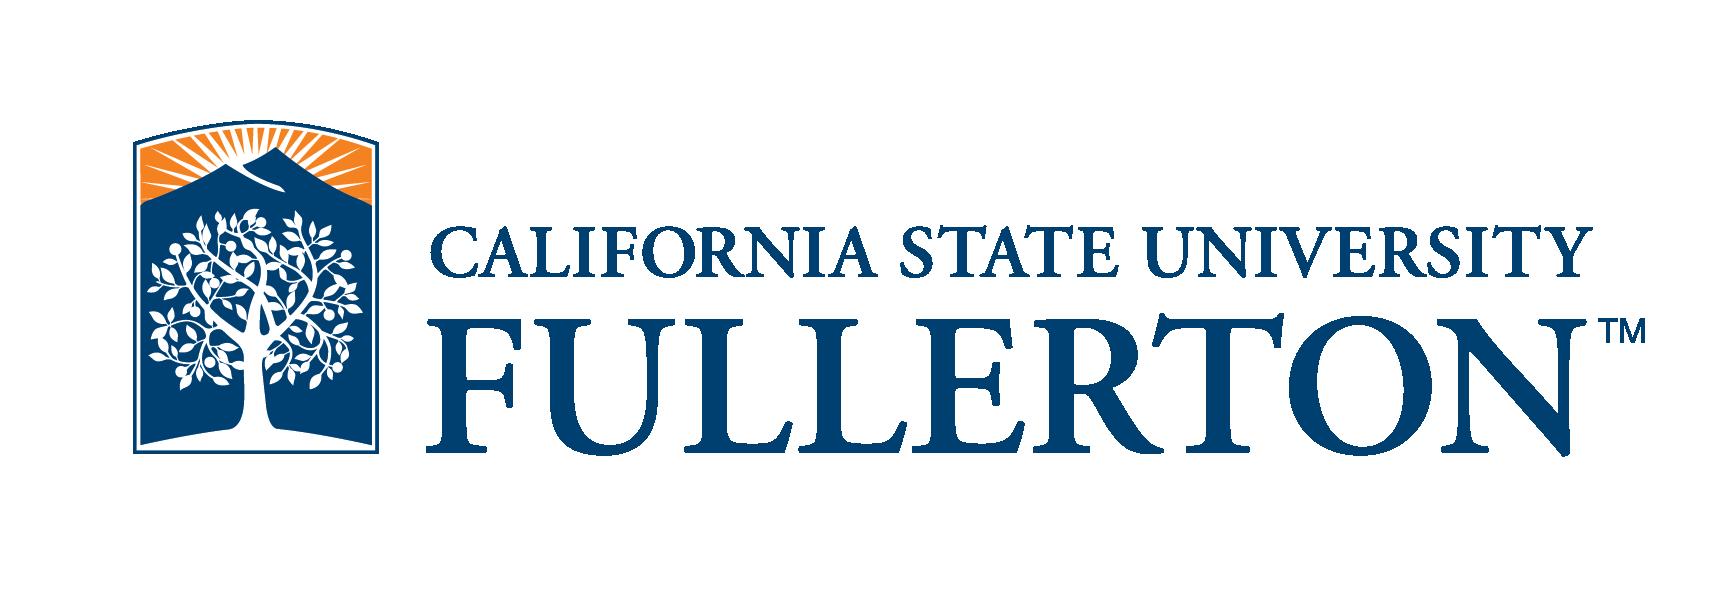 California State U. Fullerton